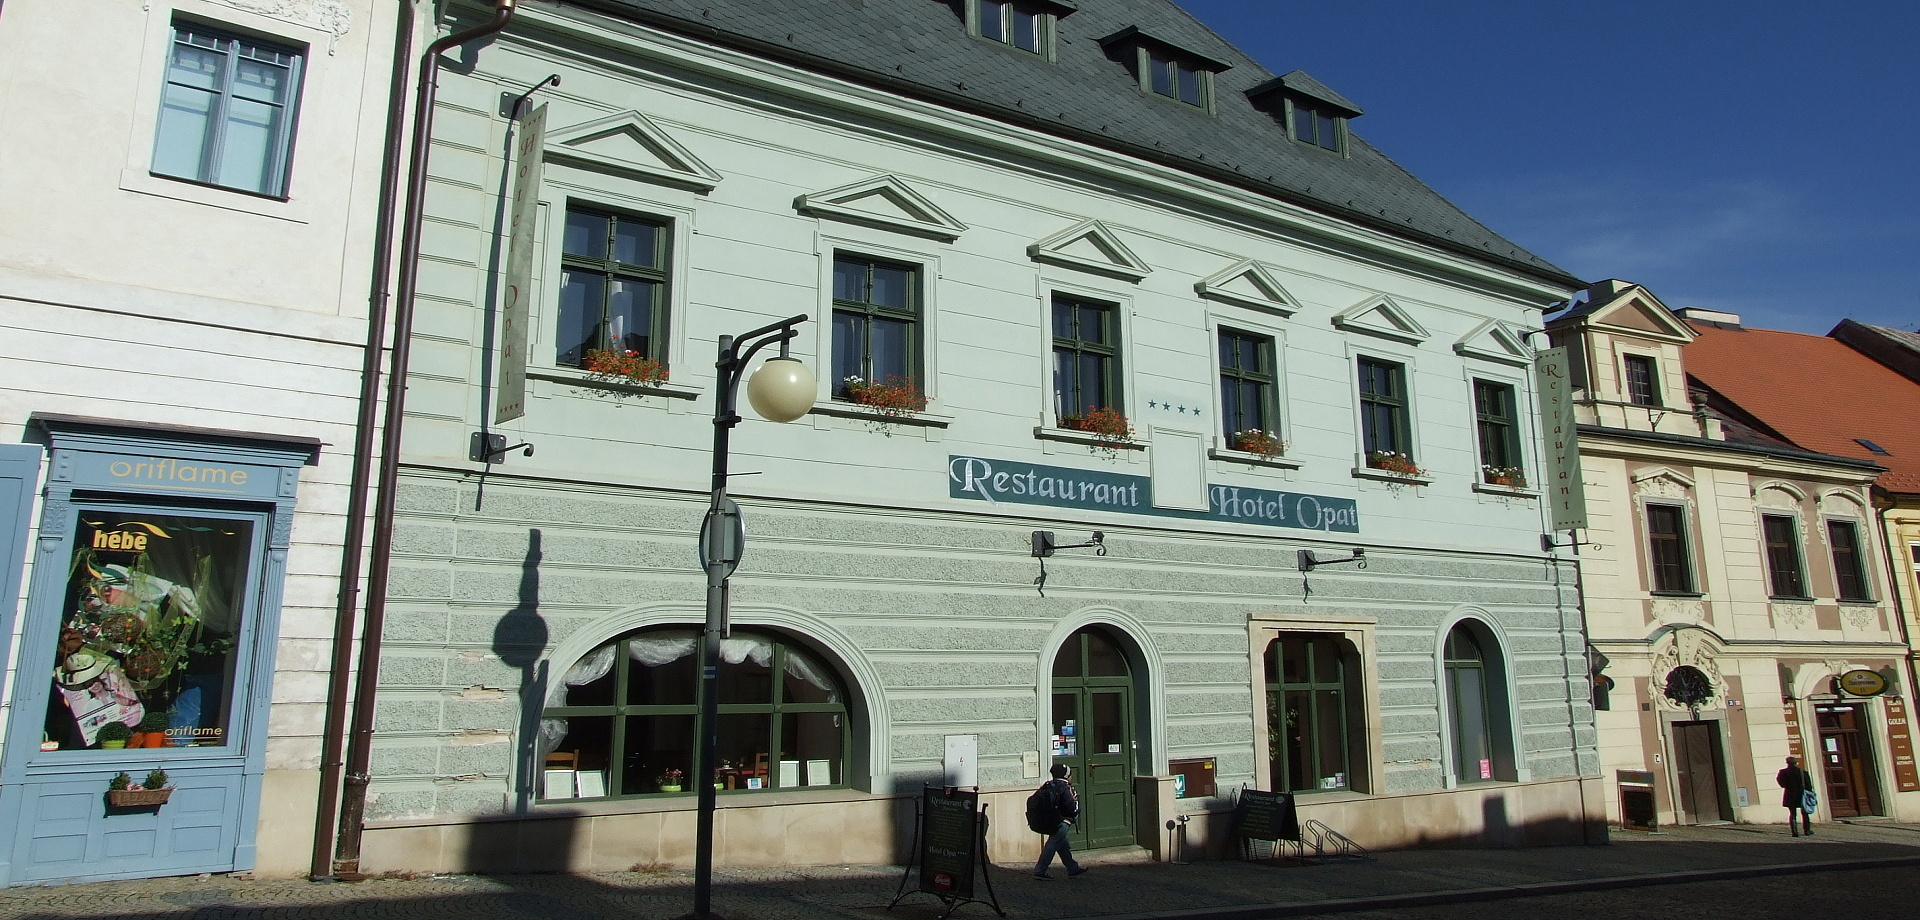 Hôtel Opat (01)